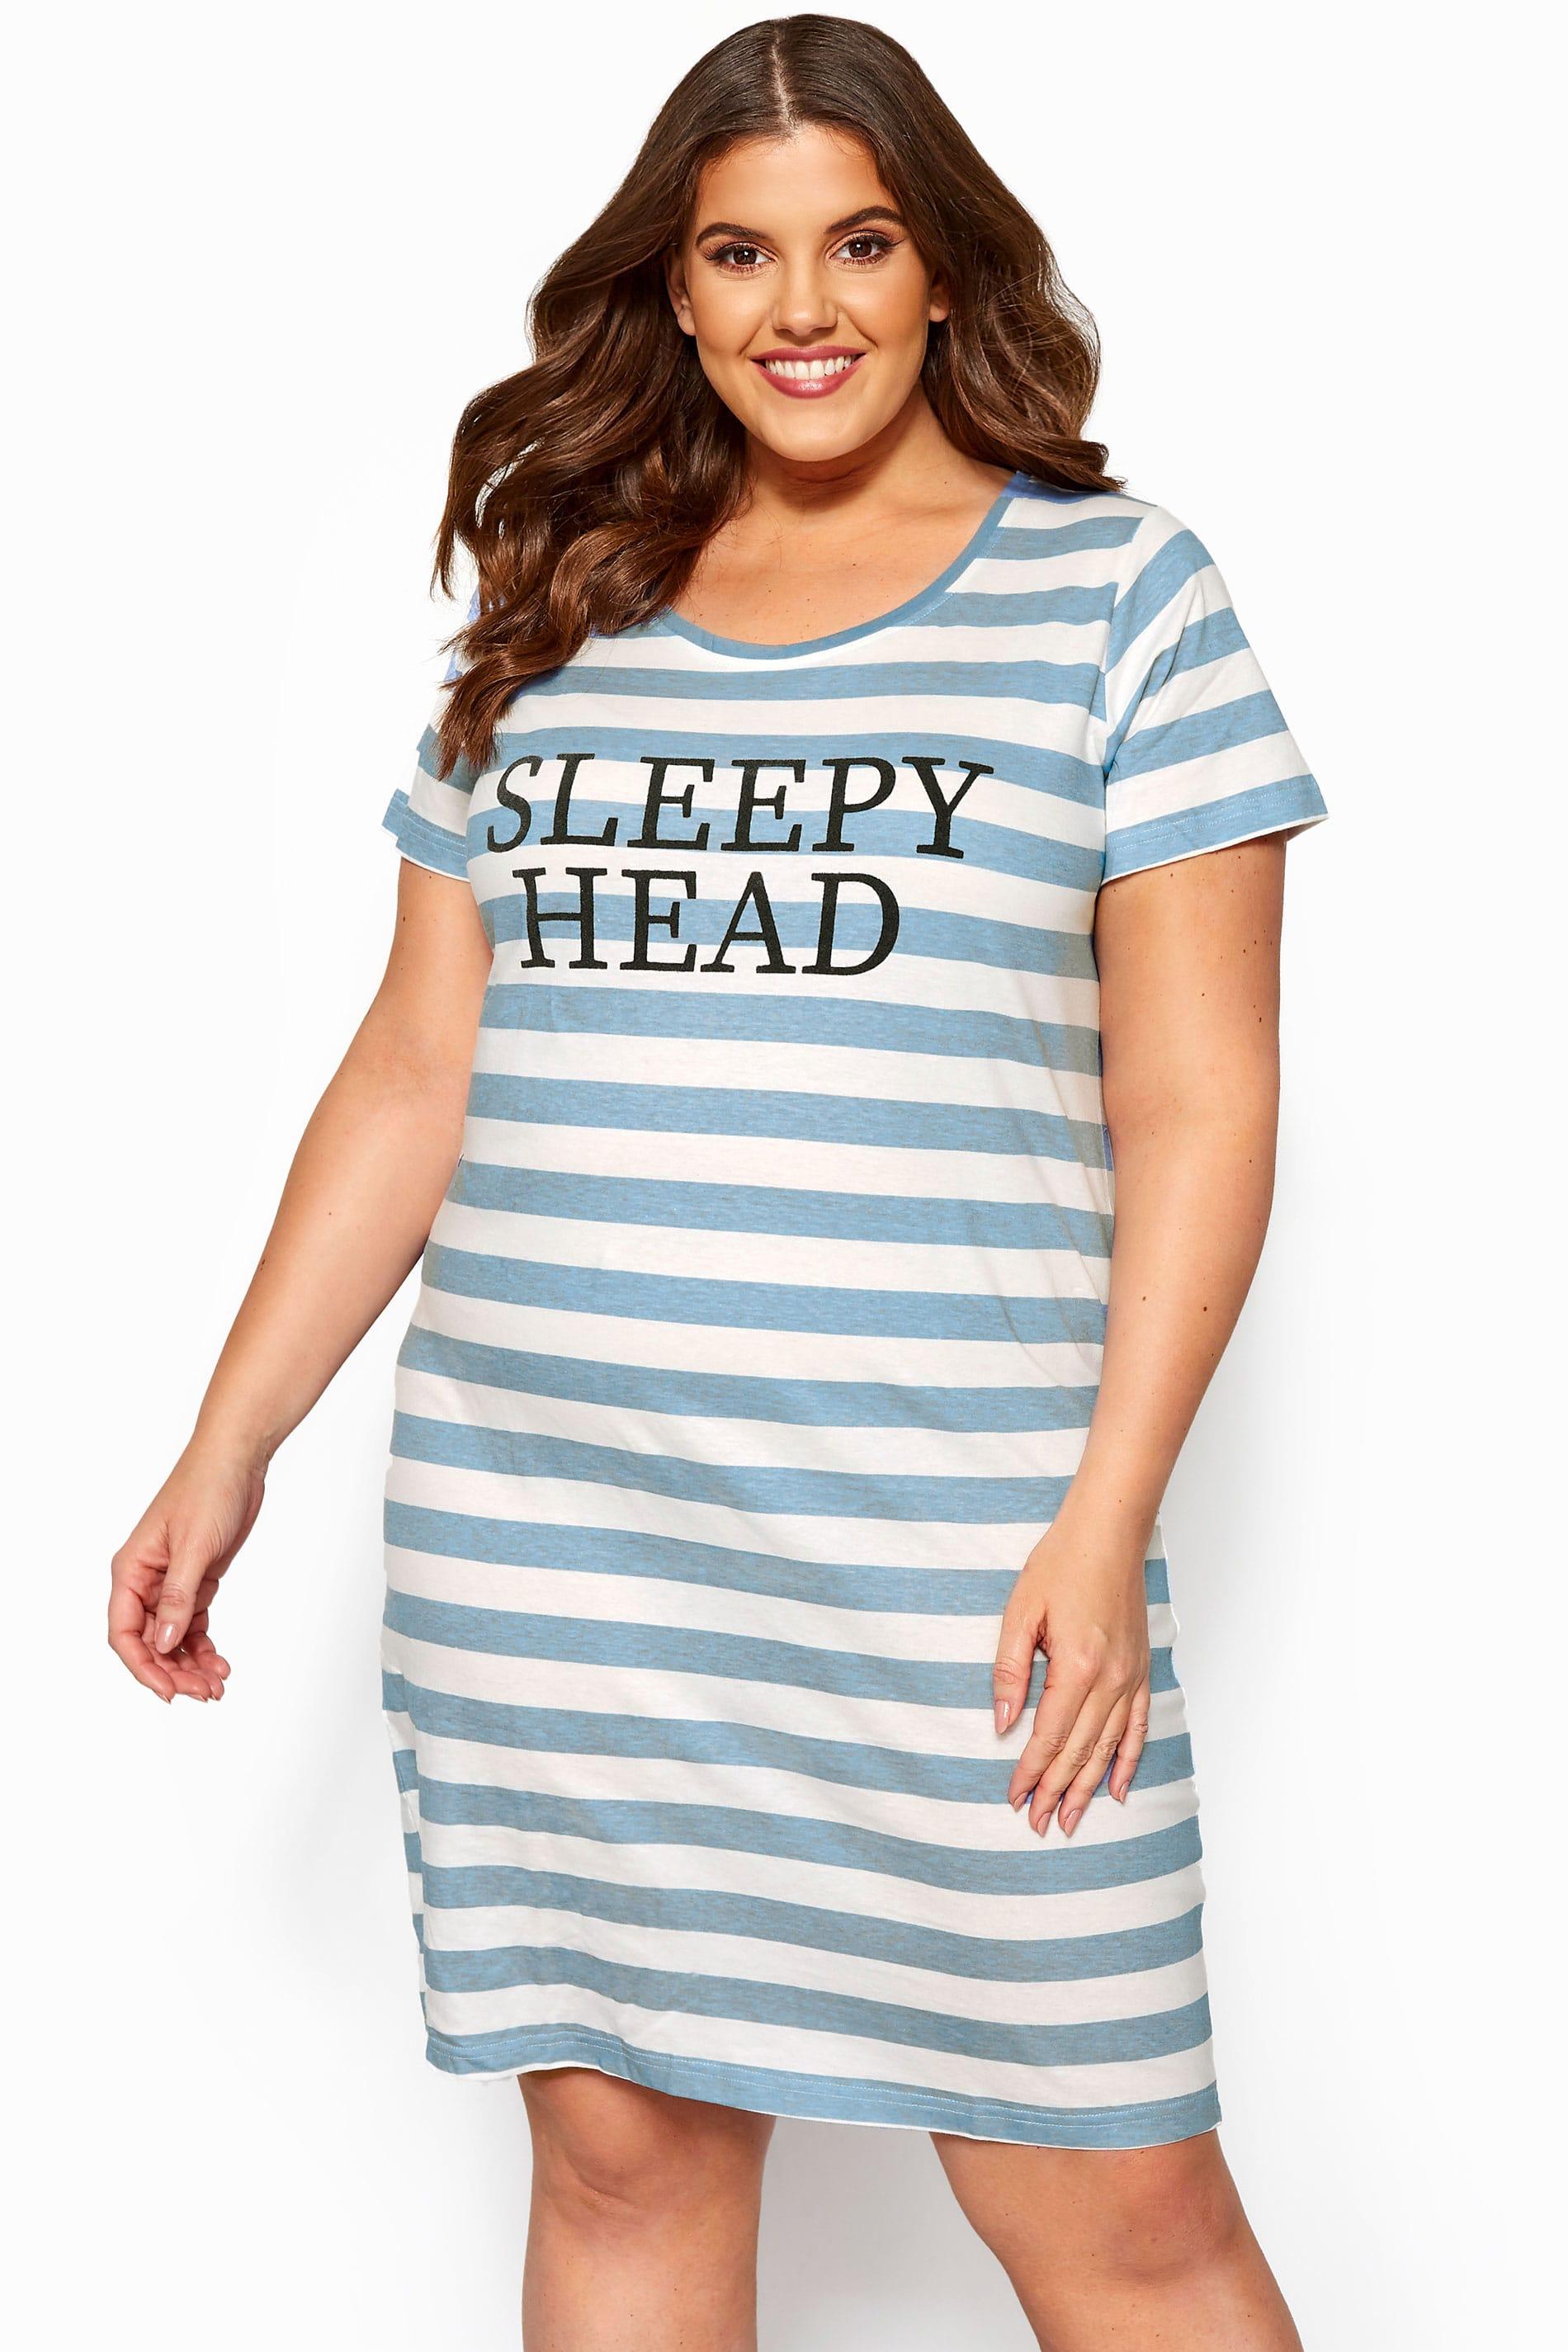 Blue & White Striped 'Sleepy Head' Nightdress